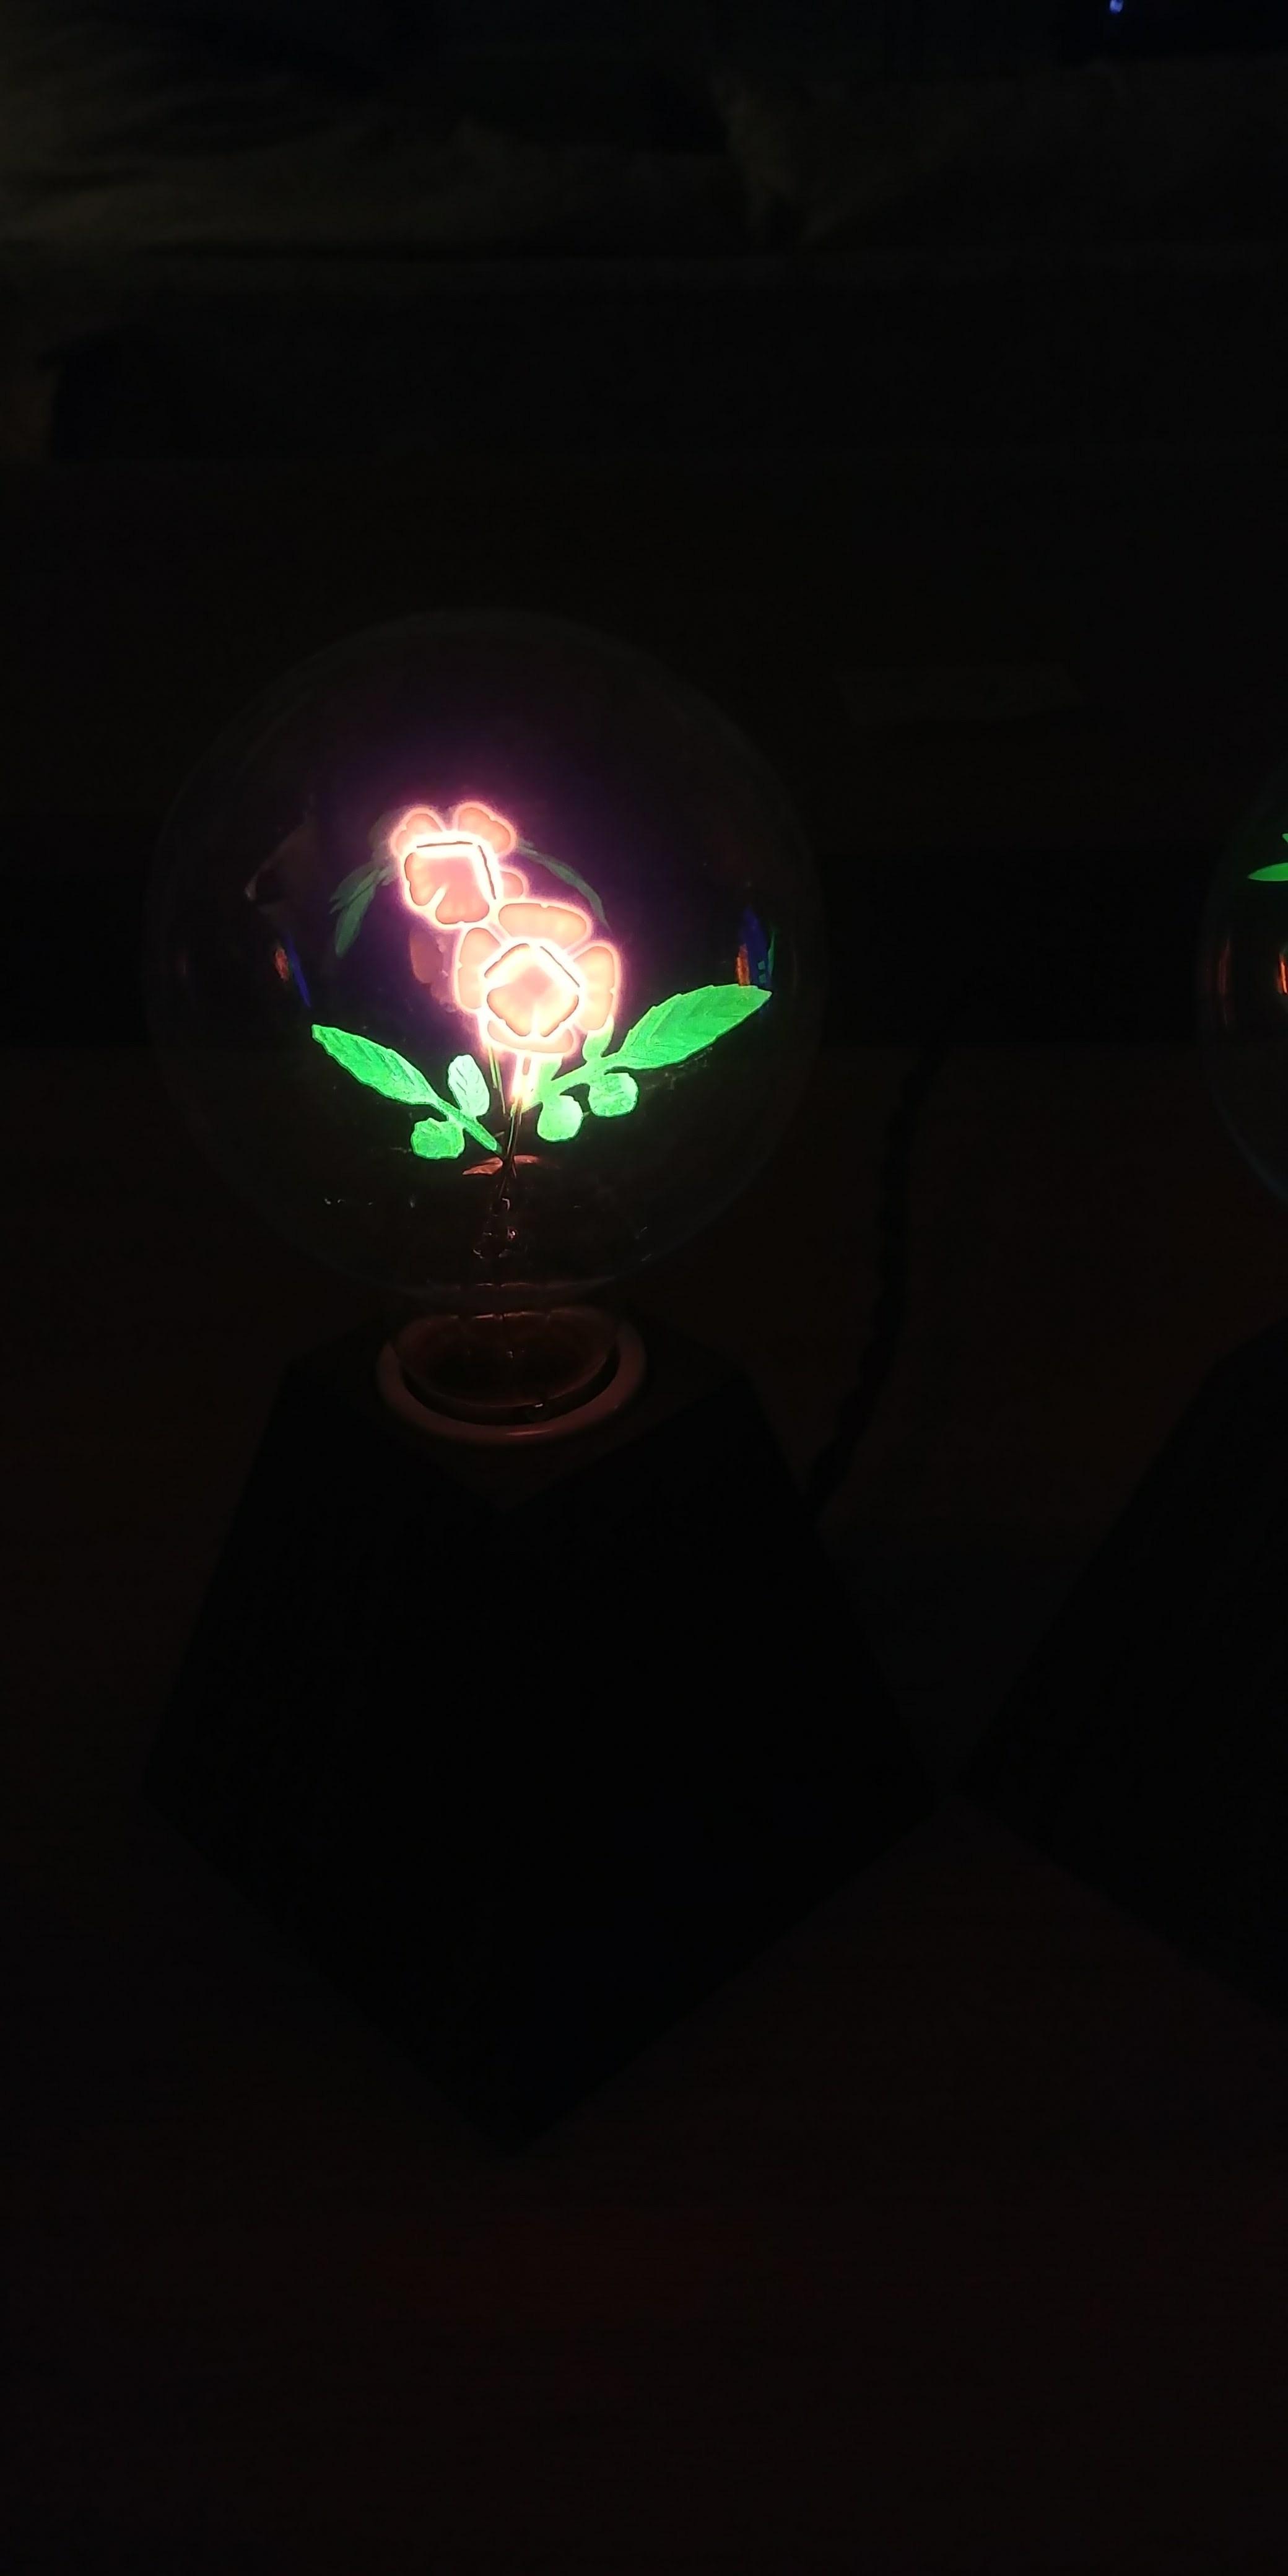 Roses (Night)